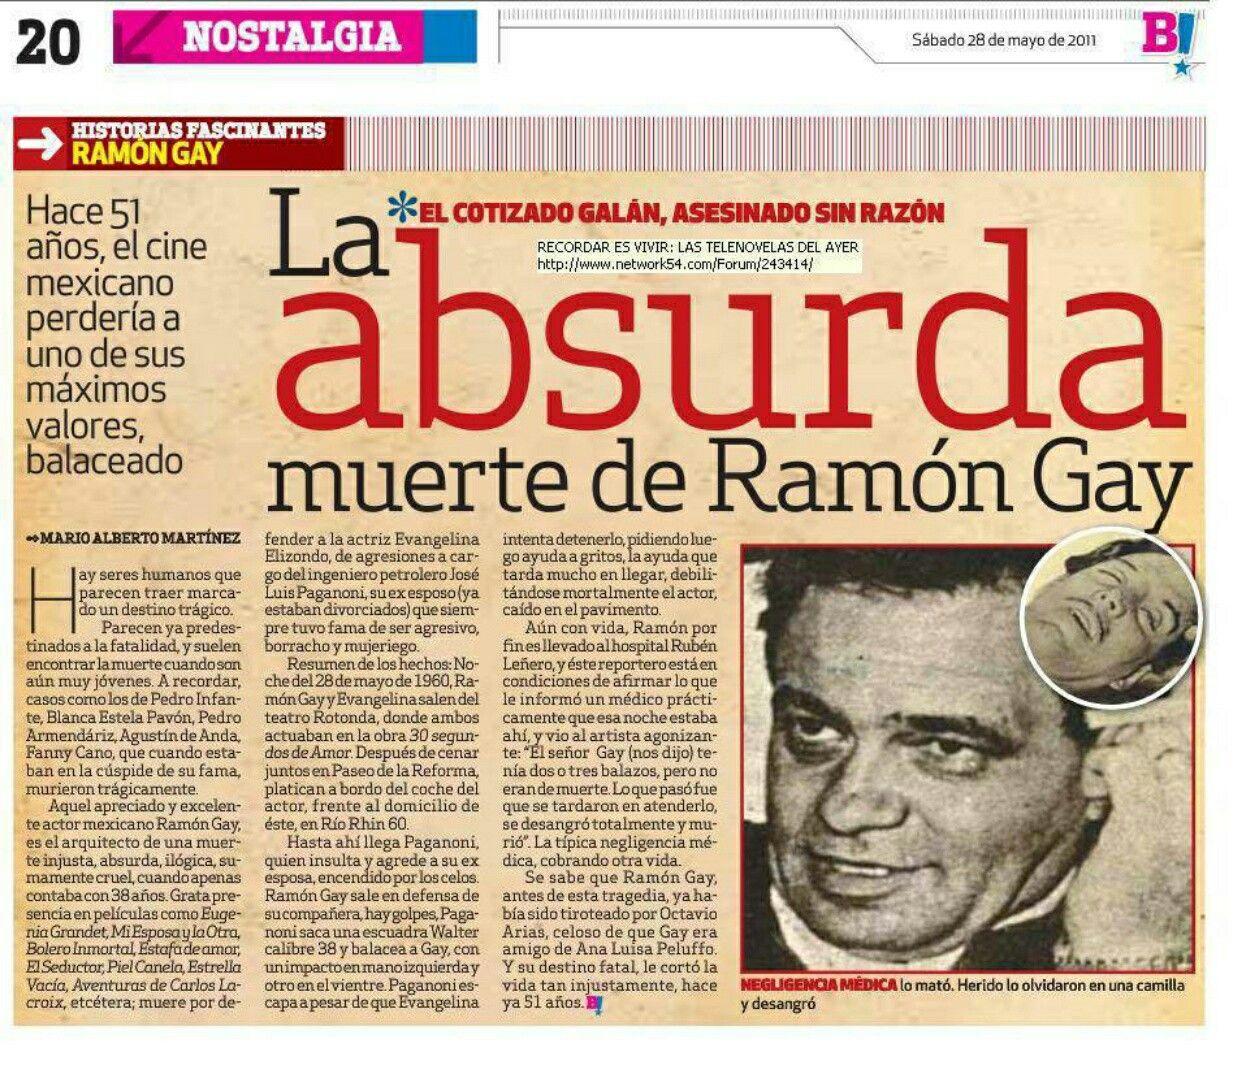 Ramon gay